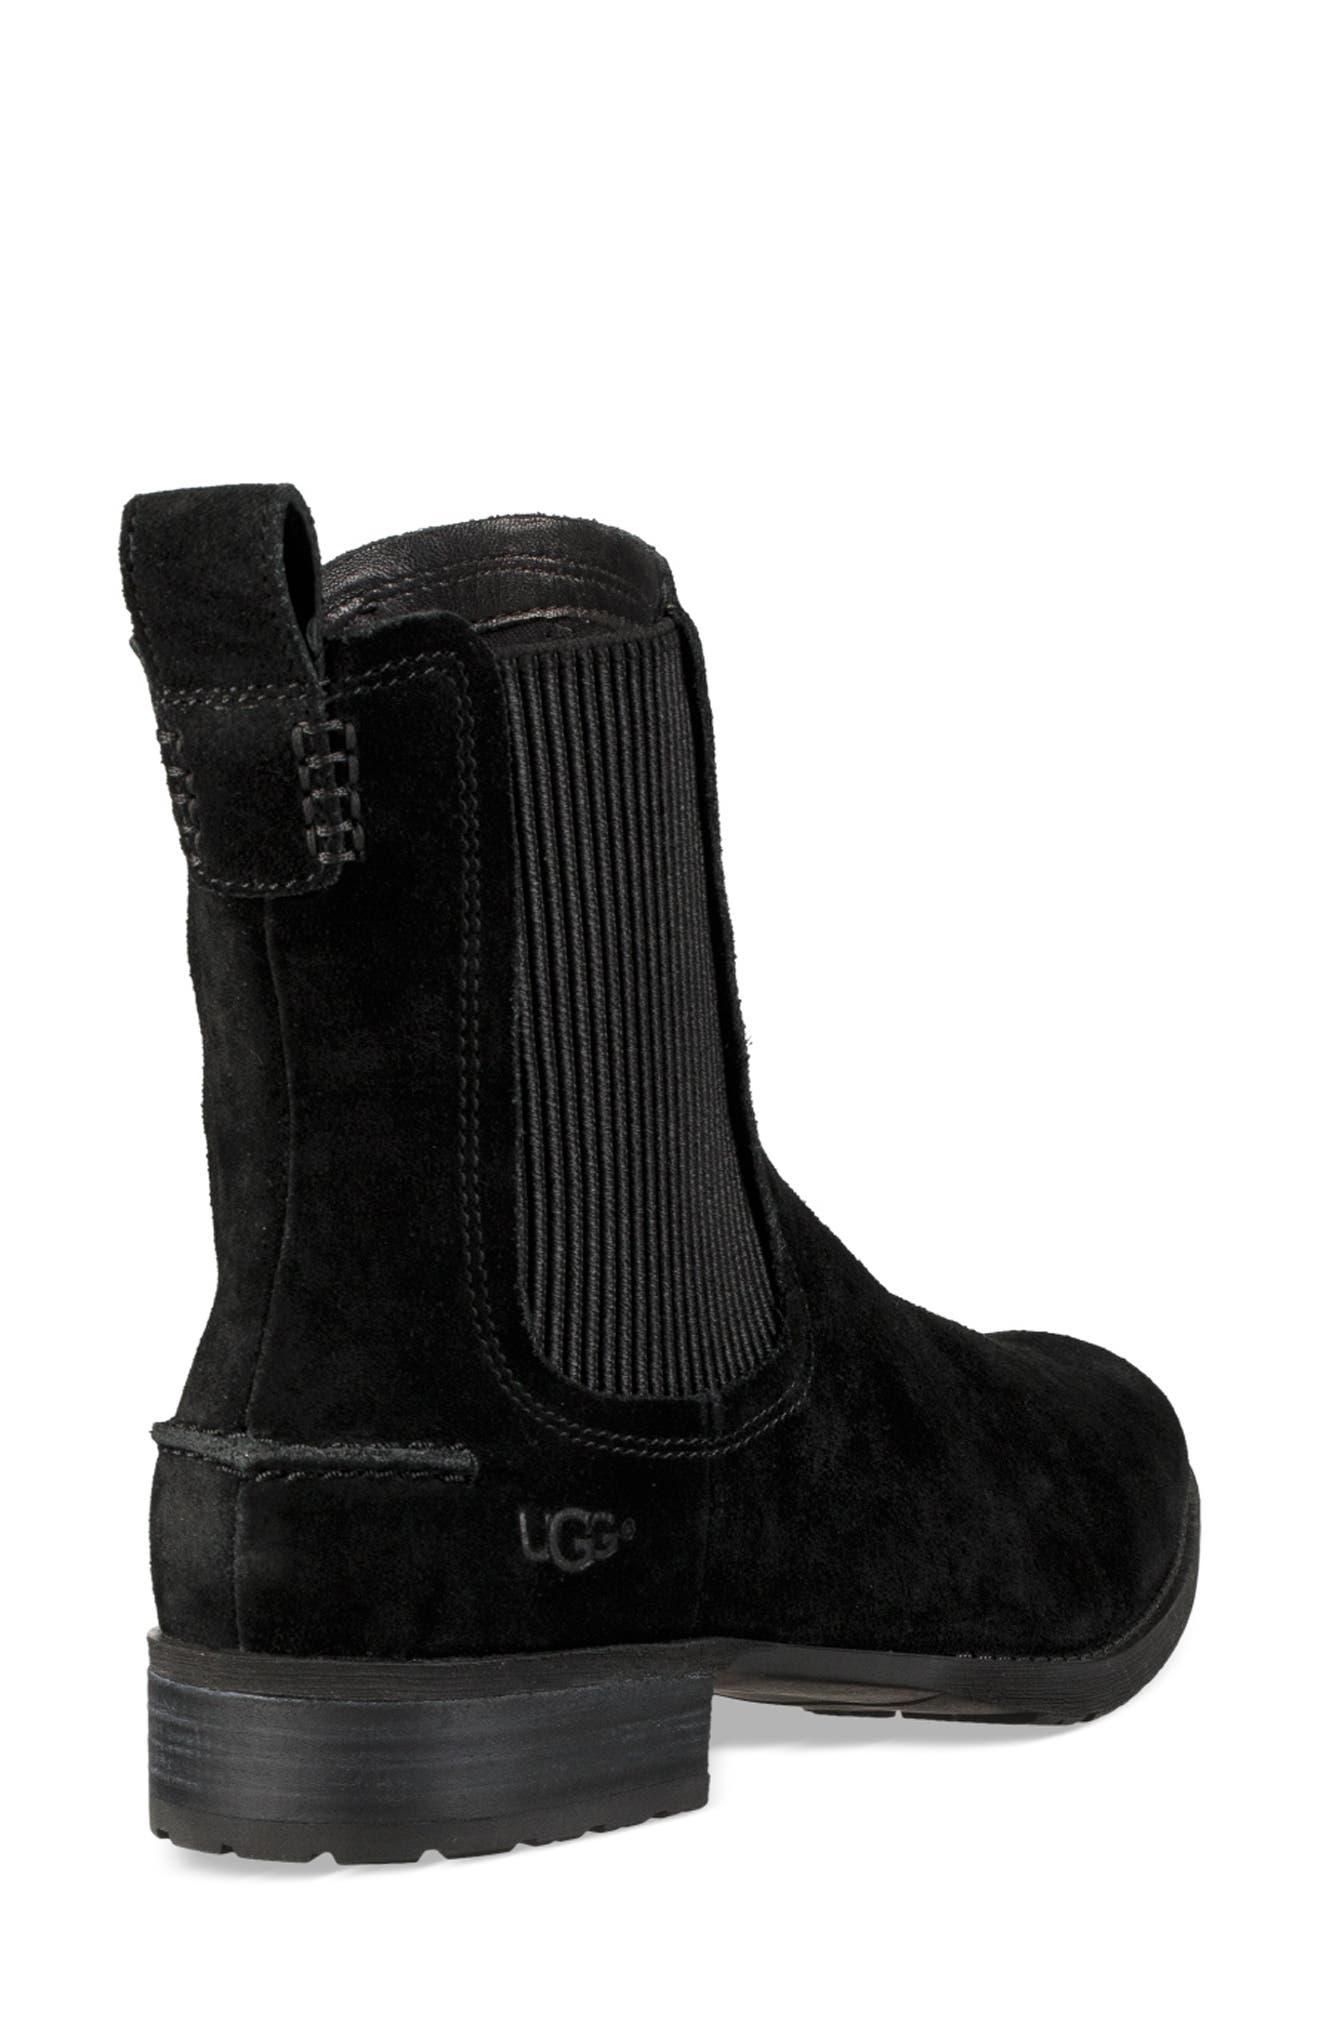 UGG<SUP>®</SUP>, Hillhurst Chelsea Boot, Alternate thumbnail 2, color, 001